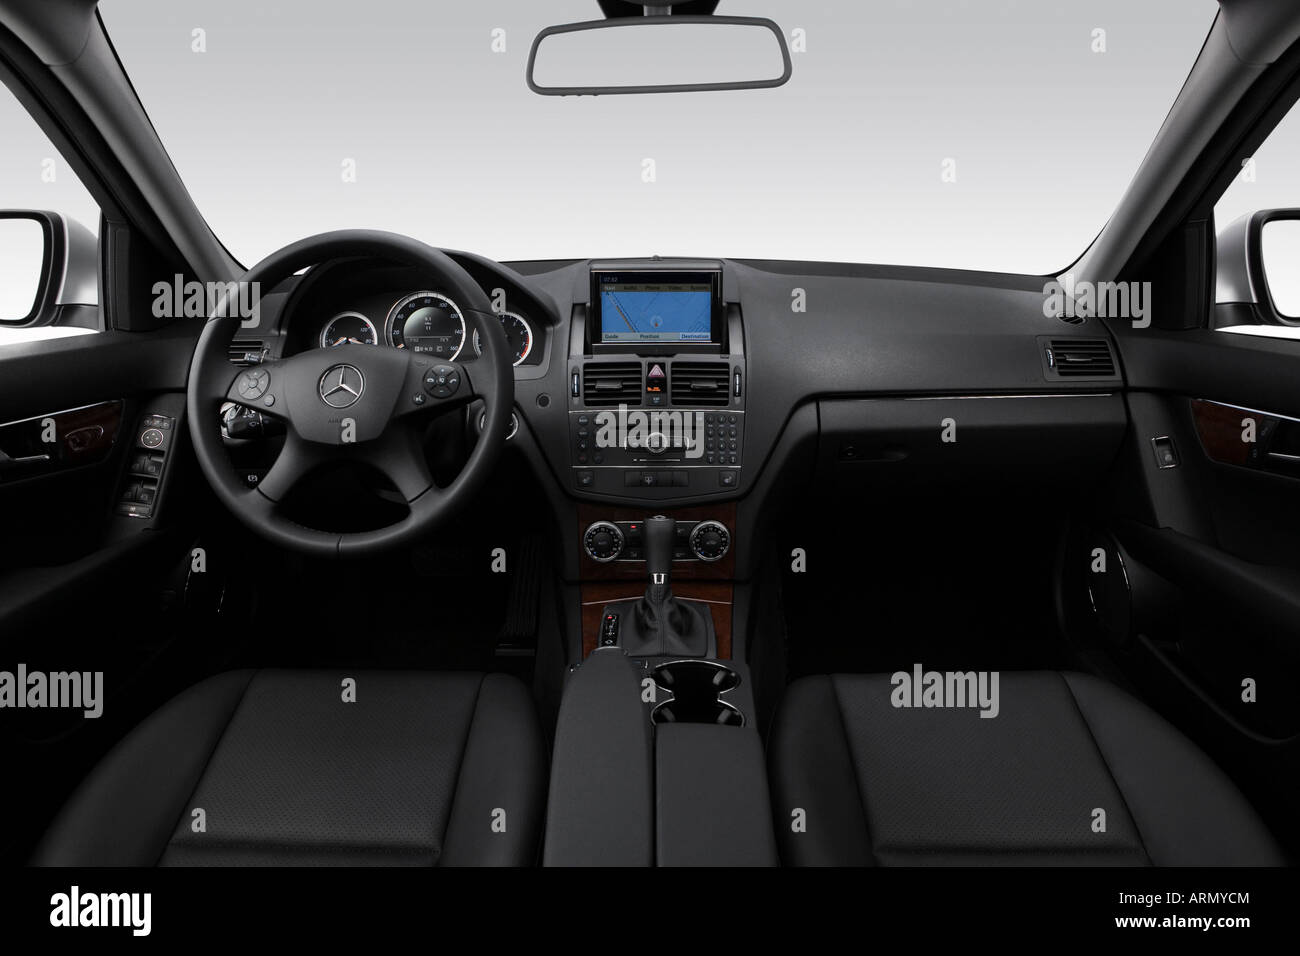 2008 mercedes benz c class c300 in silver dashboard for Mercedes benz c250 2008